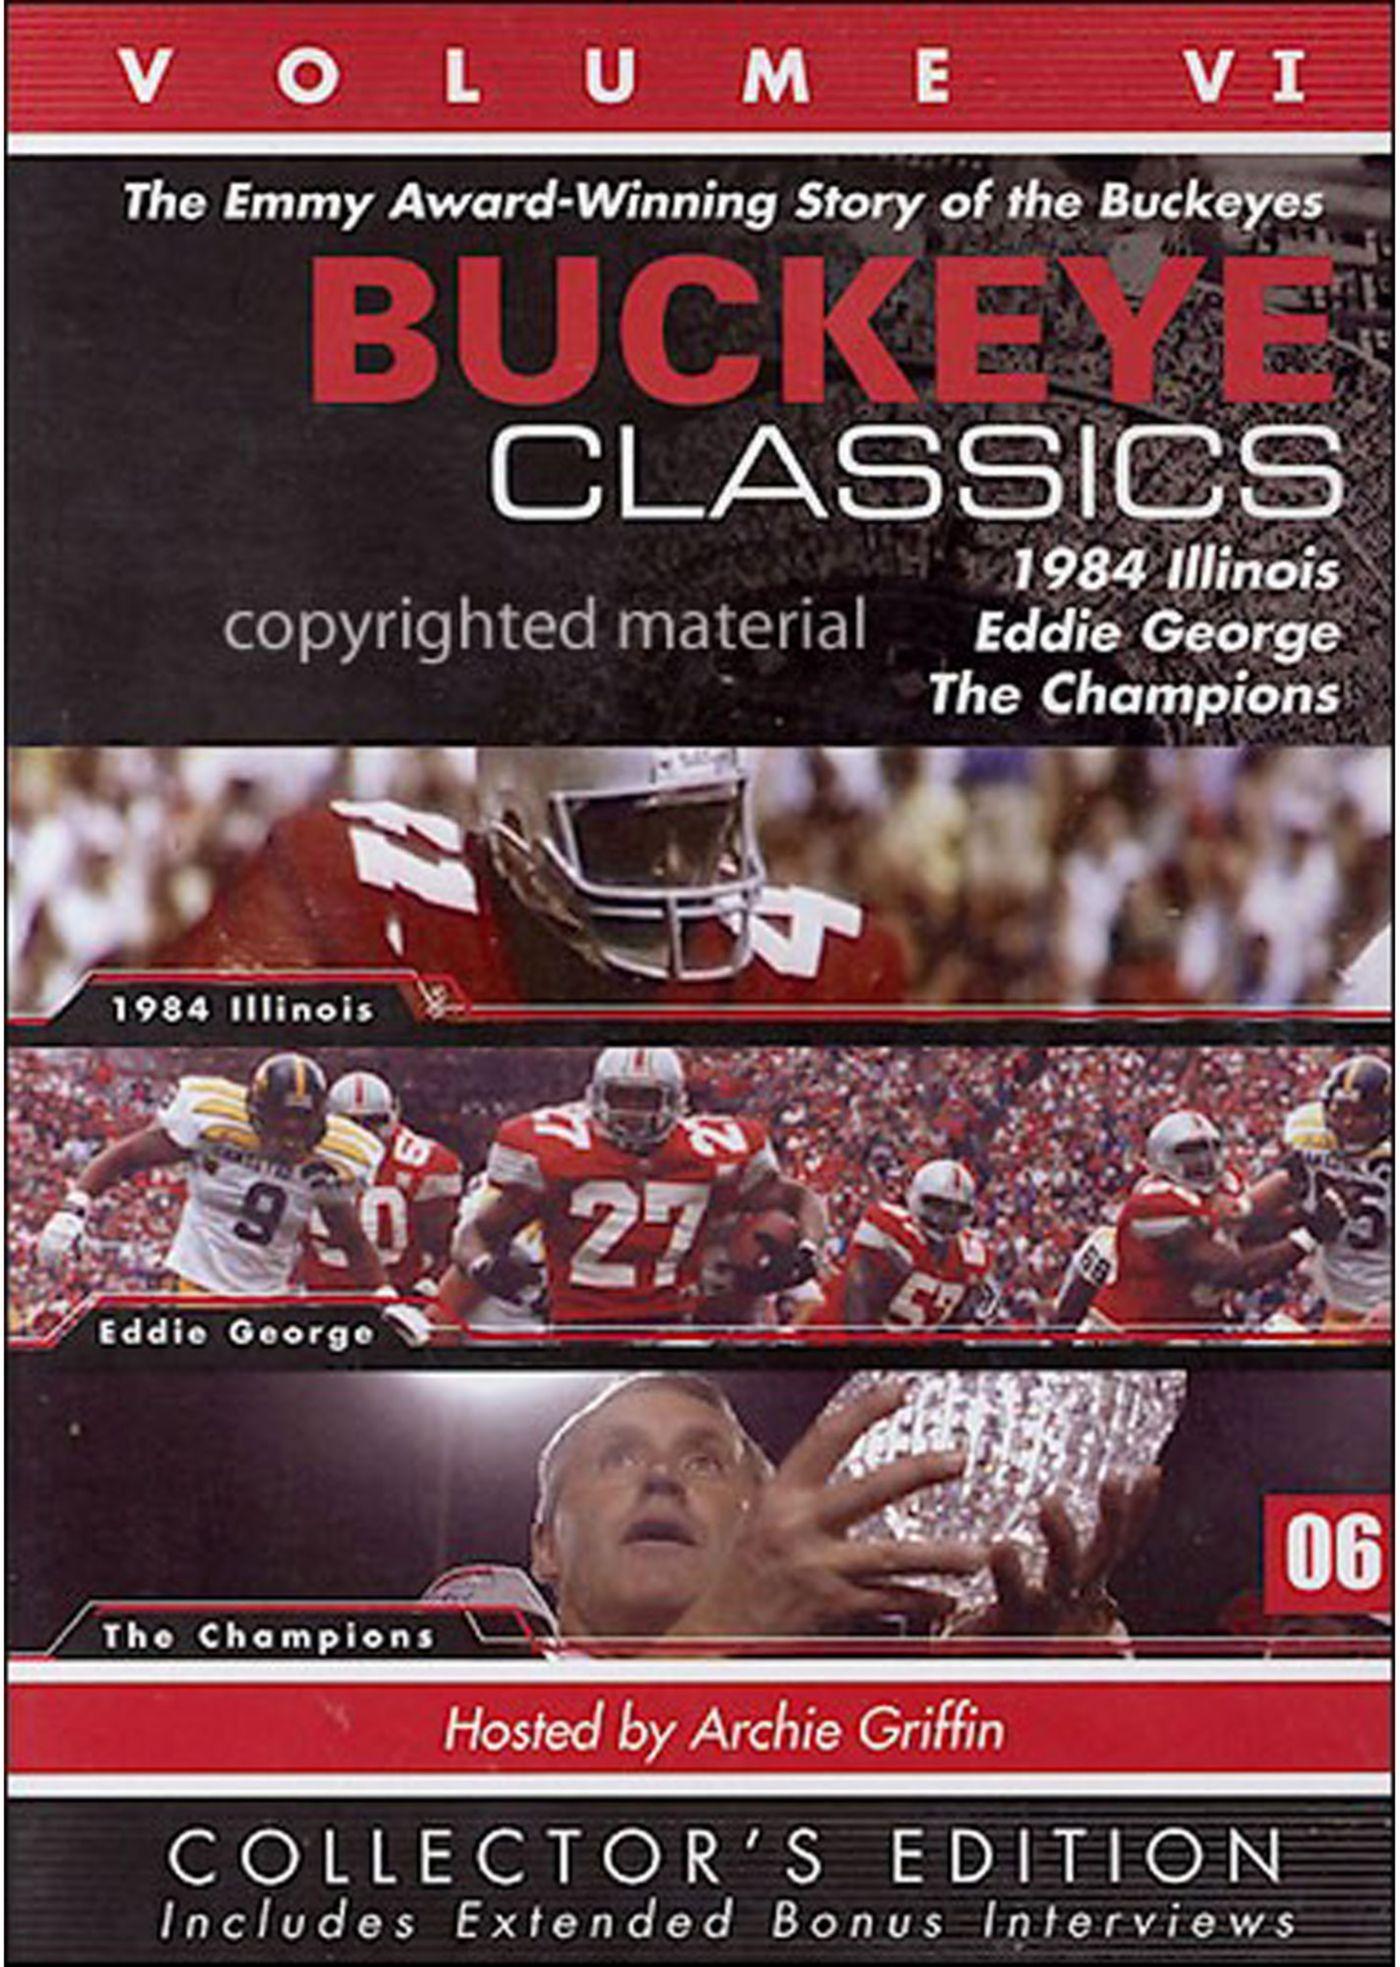 Buckeye Classics, Vol. 6 DVD